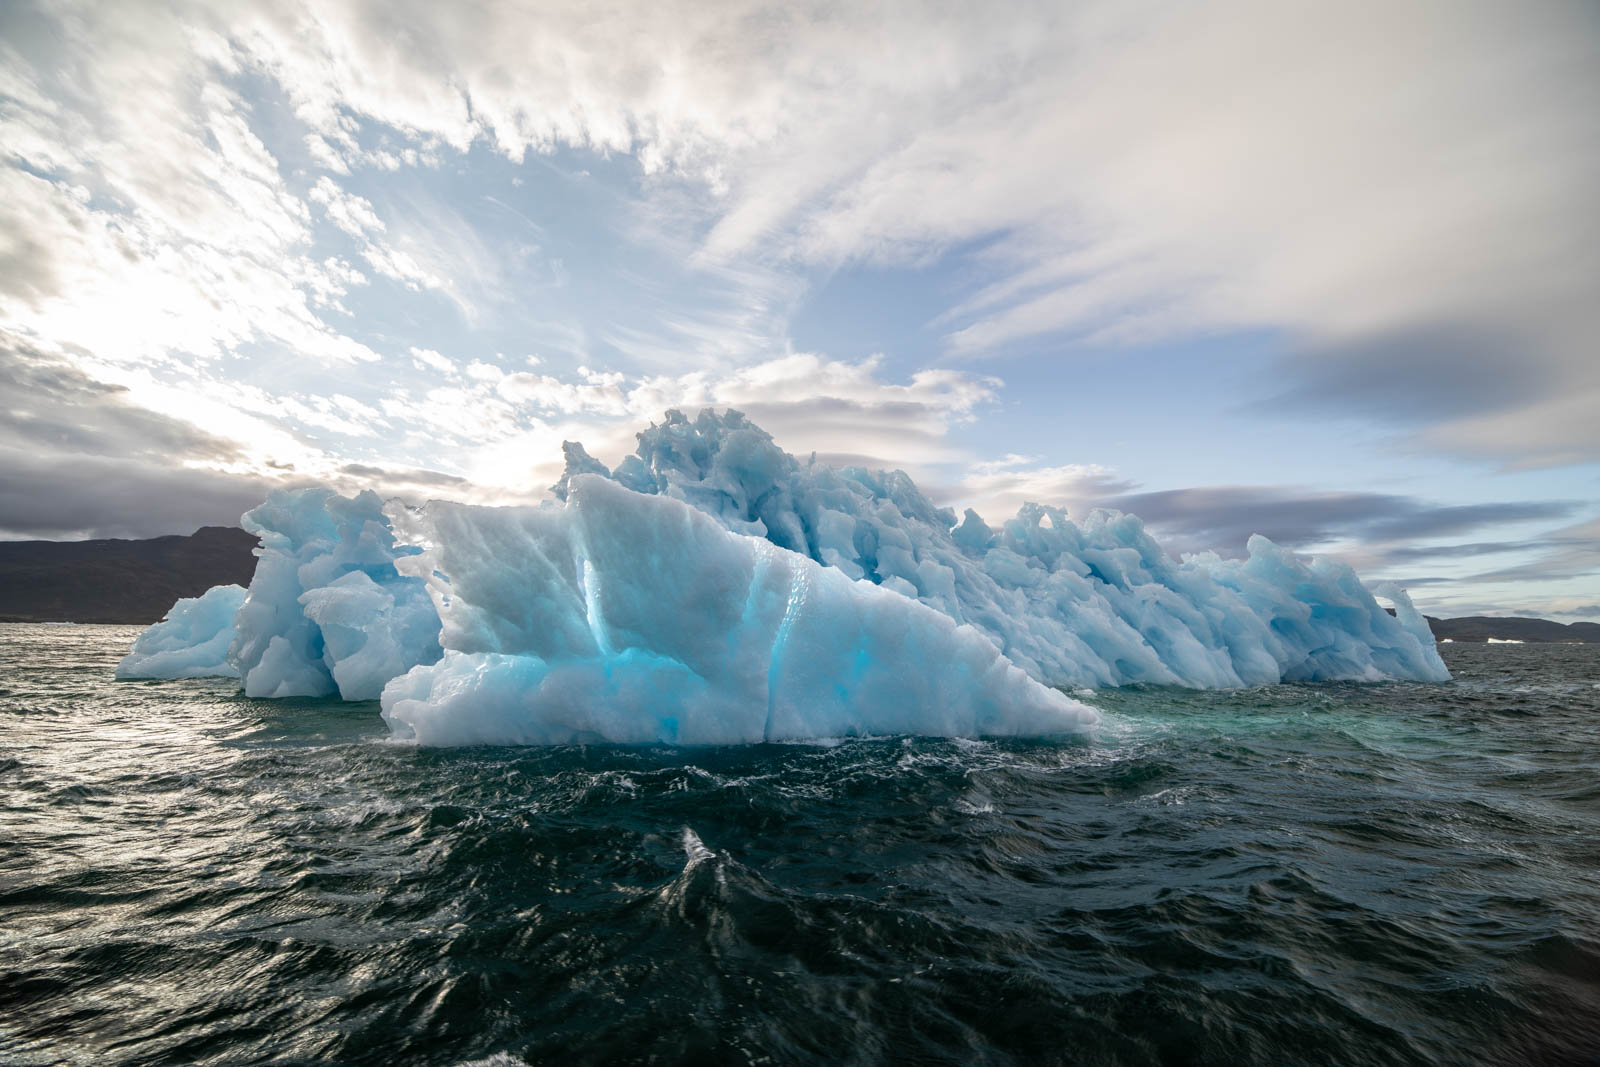 Was ist verrückter - Himmel oder Eisberg?